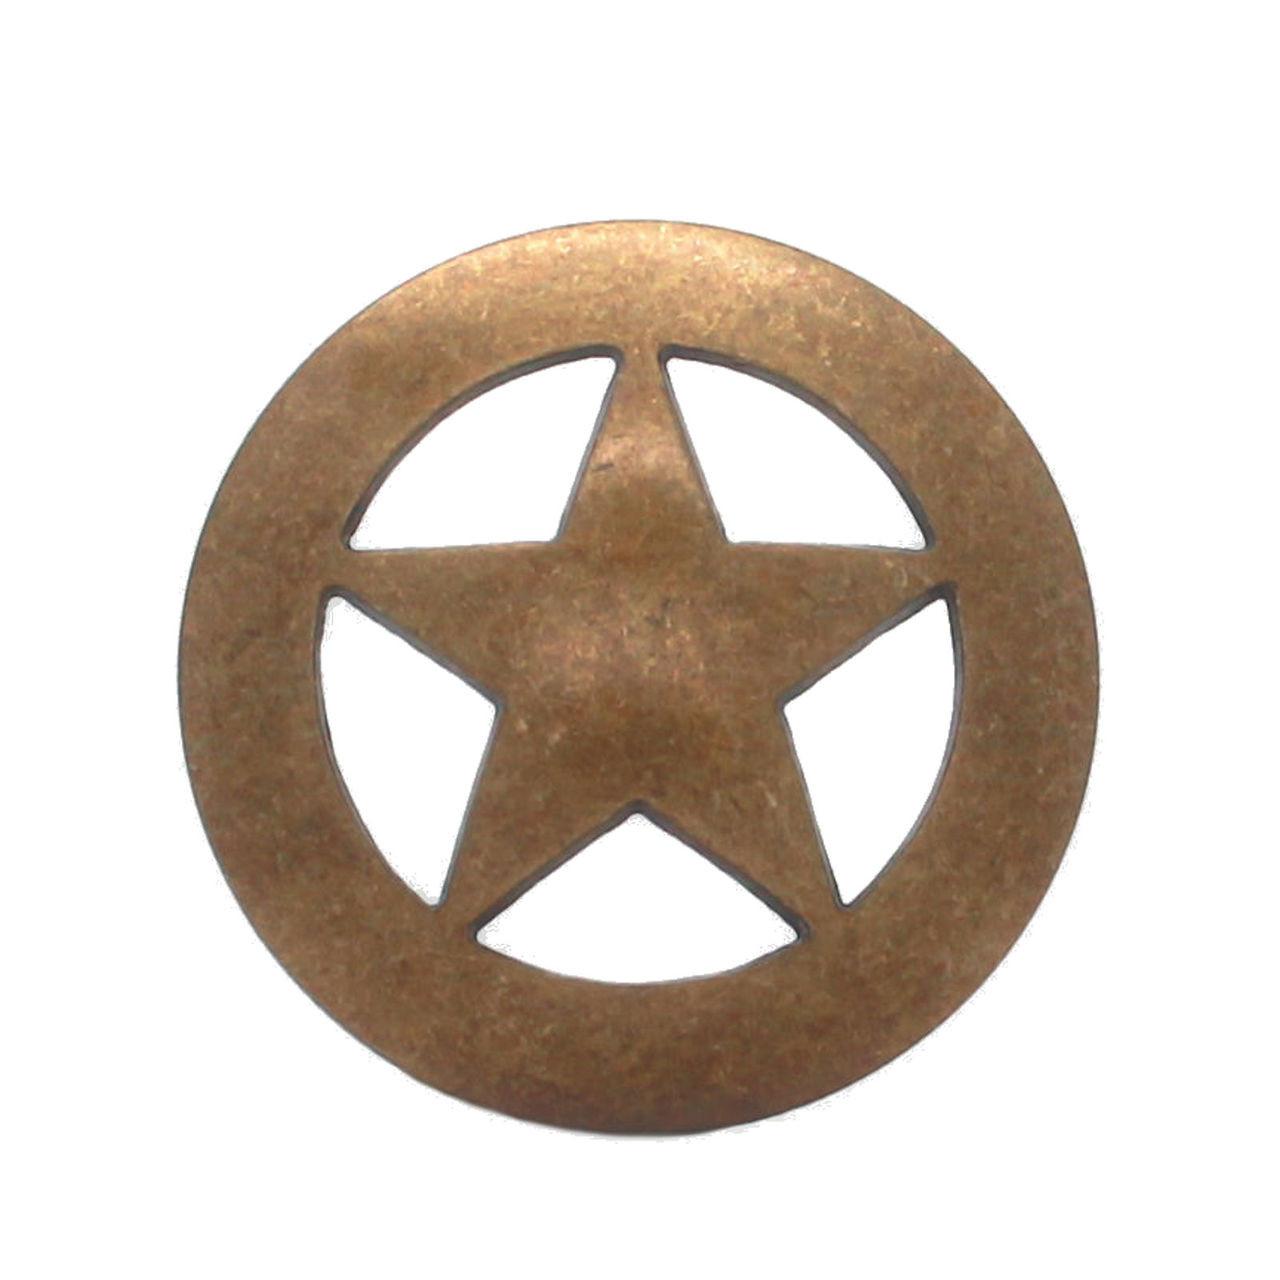 "Smooth Star Screw Back Concho Antique Brass 3/4"" 7536-21 Stecksstore"